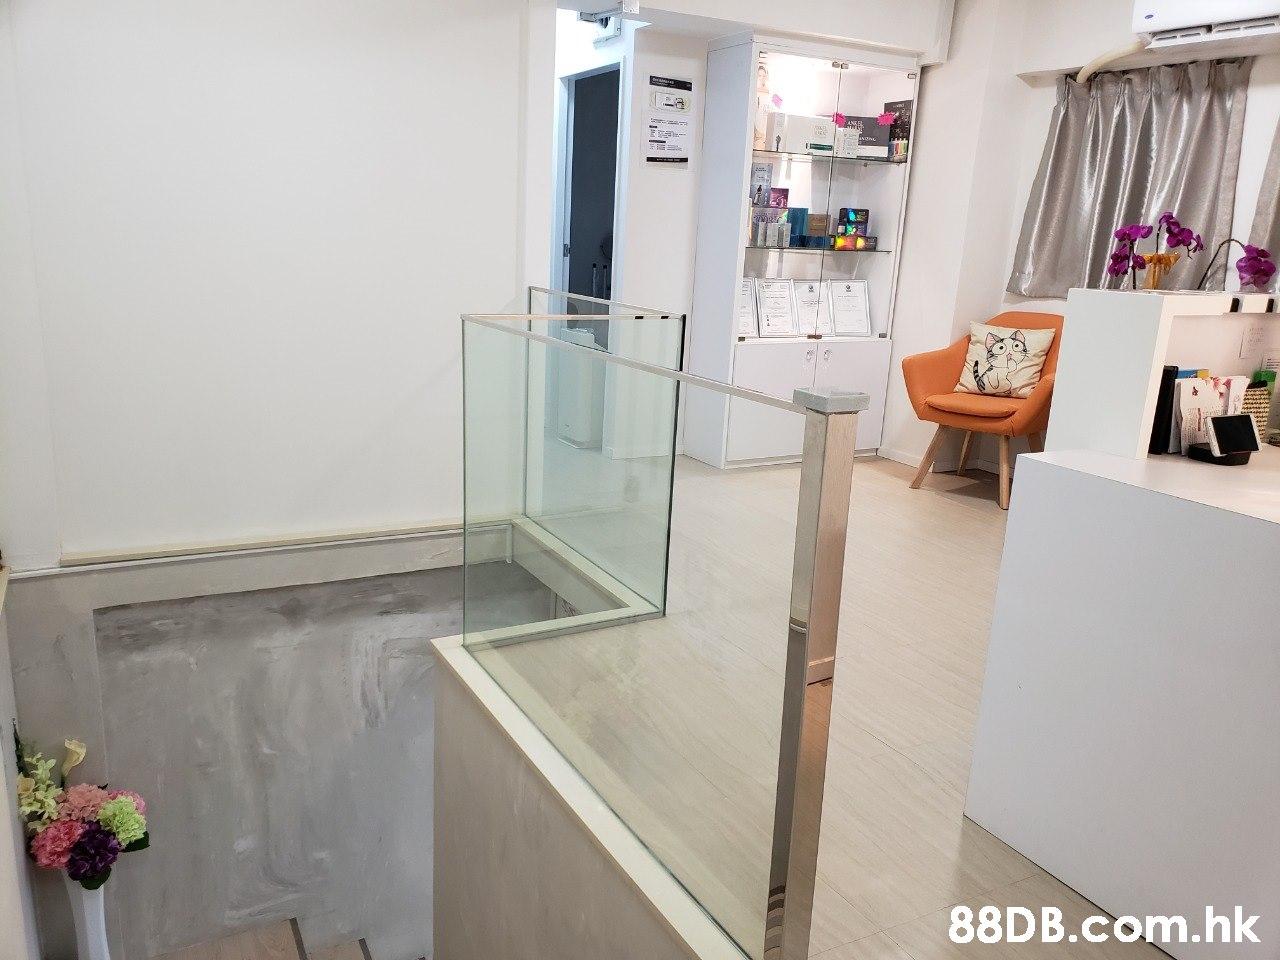 .hk  Property,Room,Floor,Interior design,Building